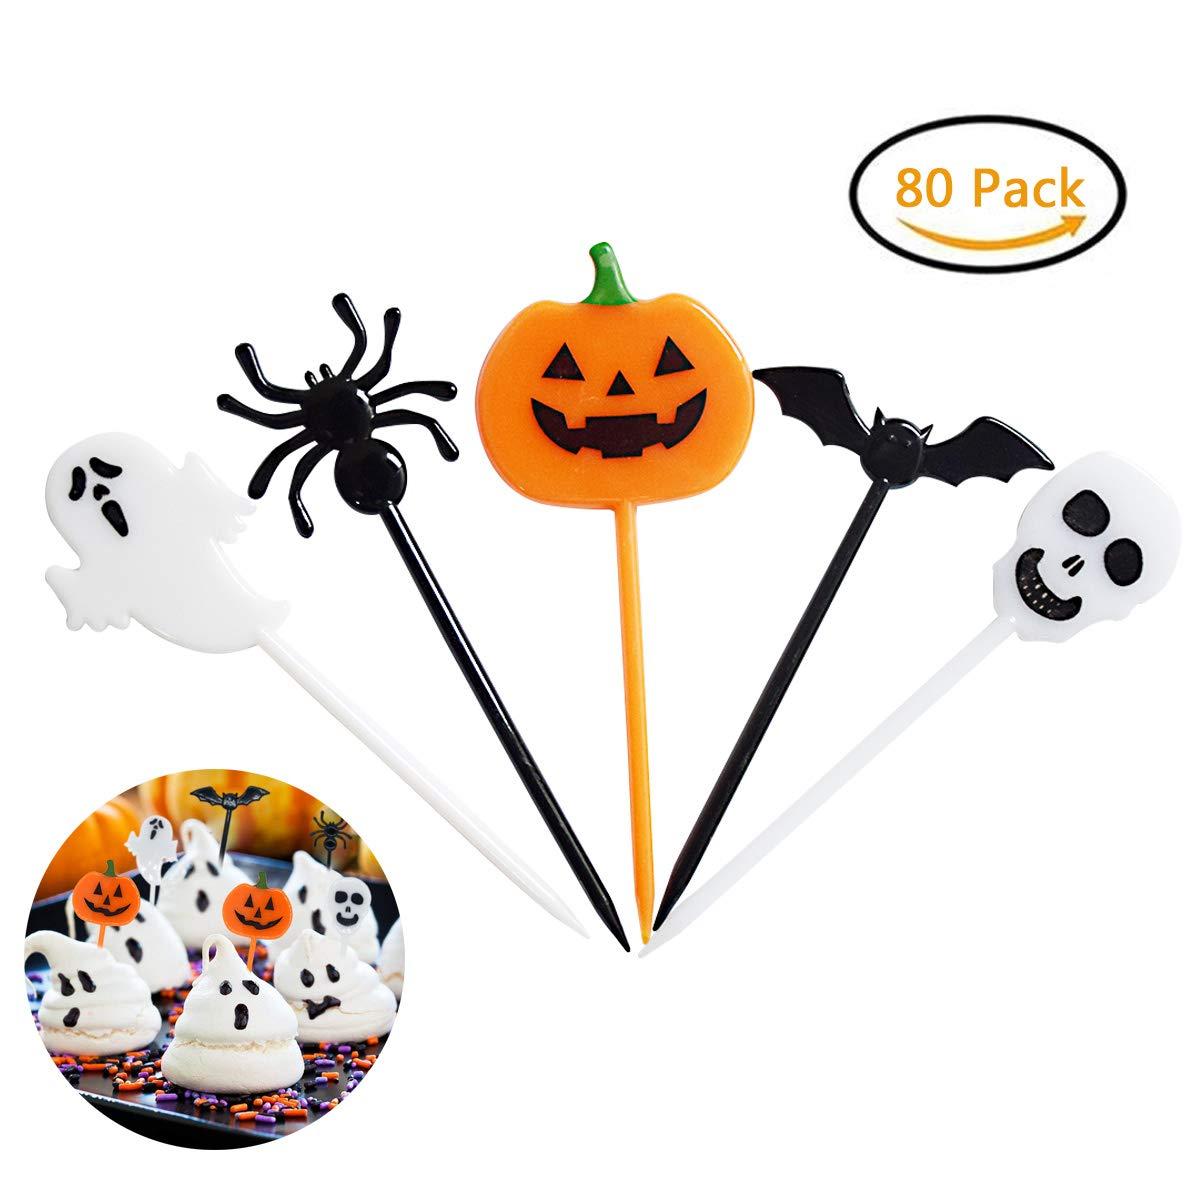 Halloween Food Picks Cupcake Toppers Decorations Halloween Party Picks Halloween Toppers With Ghosts Spider Pumpkin Skull Bat Design Plastic Decorative Food Picks Holiday Picks IMOSA